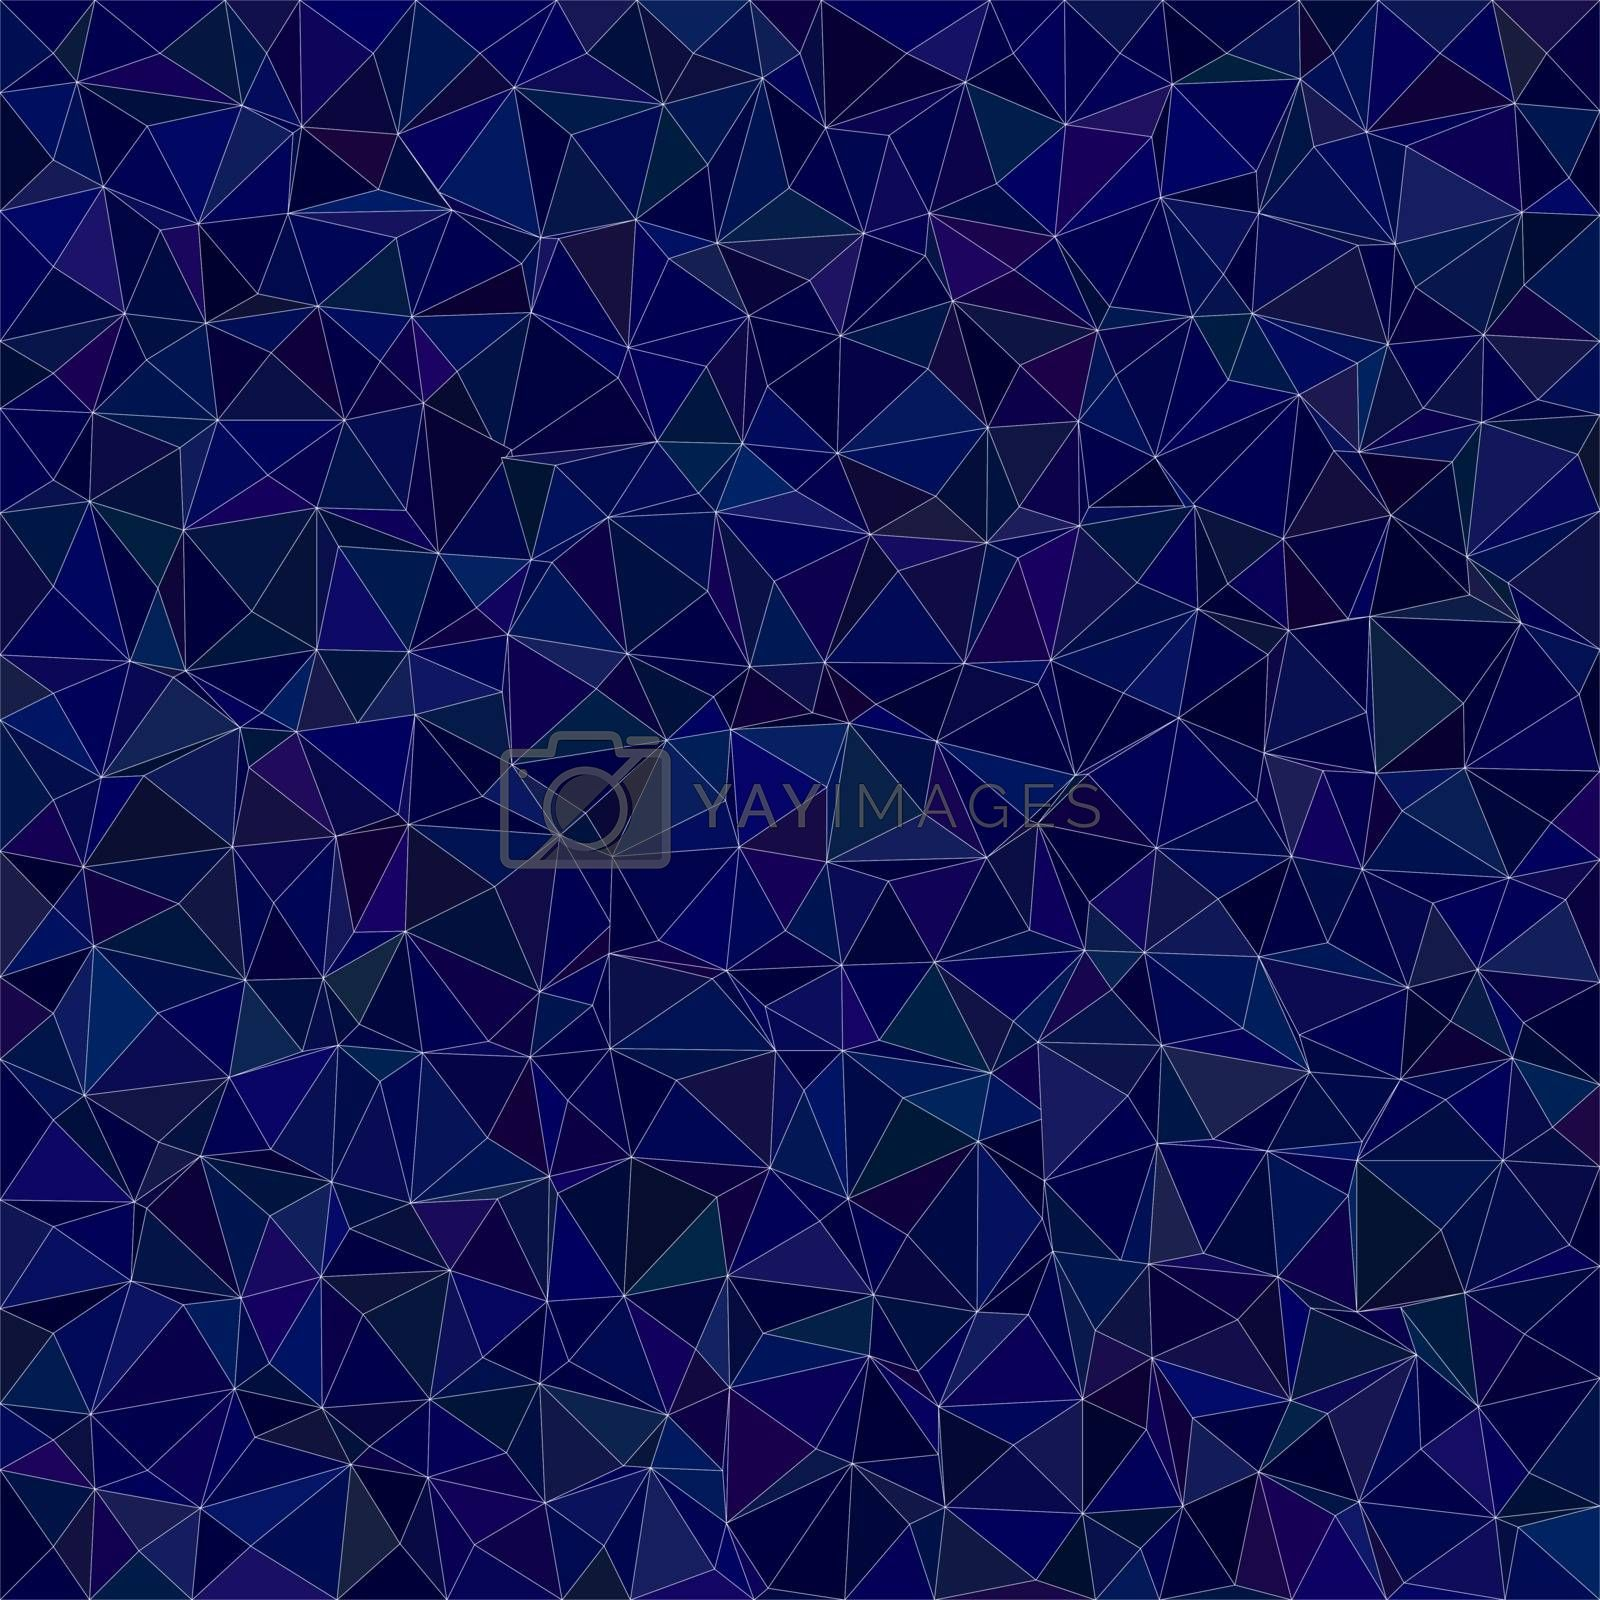 Dark blue irregular triangle mosaic vector background design